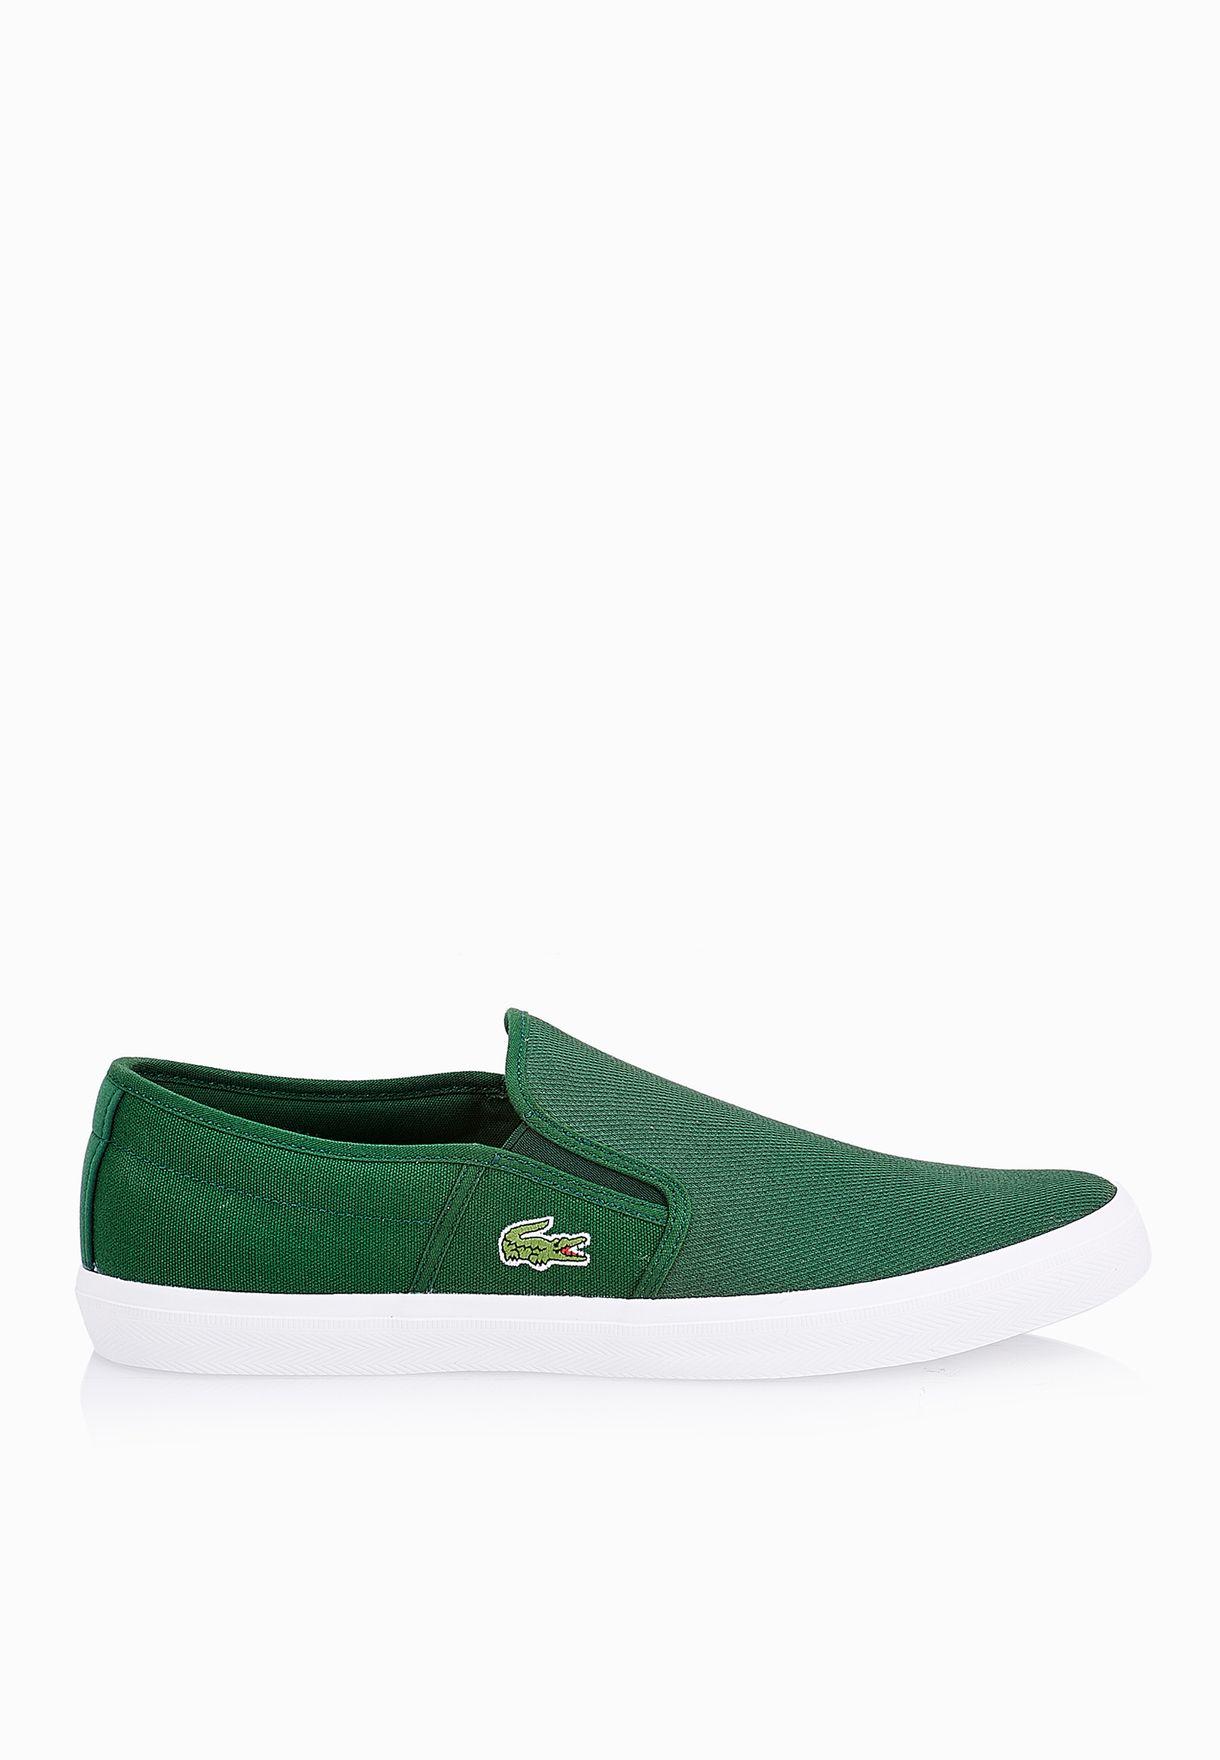 green Gazon Sport 116 1 Slip ons